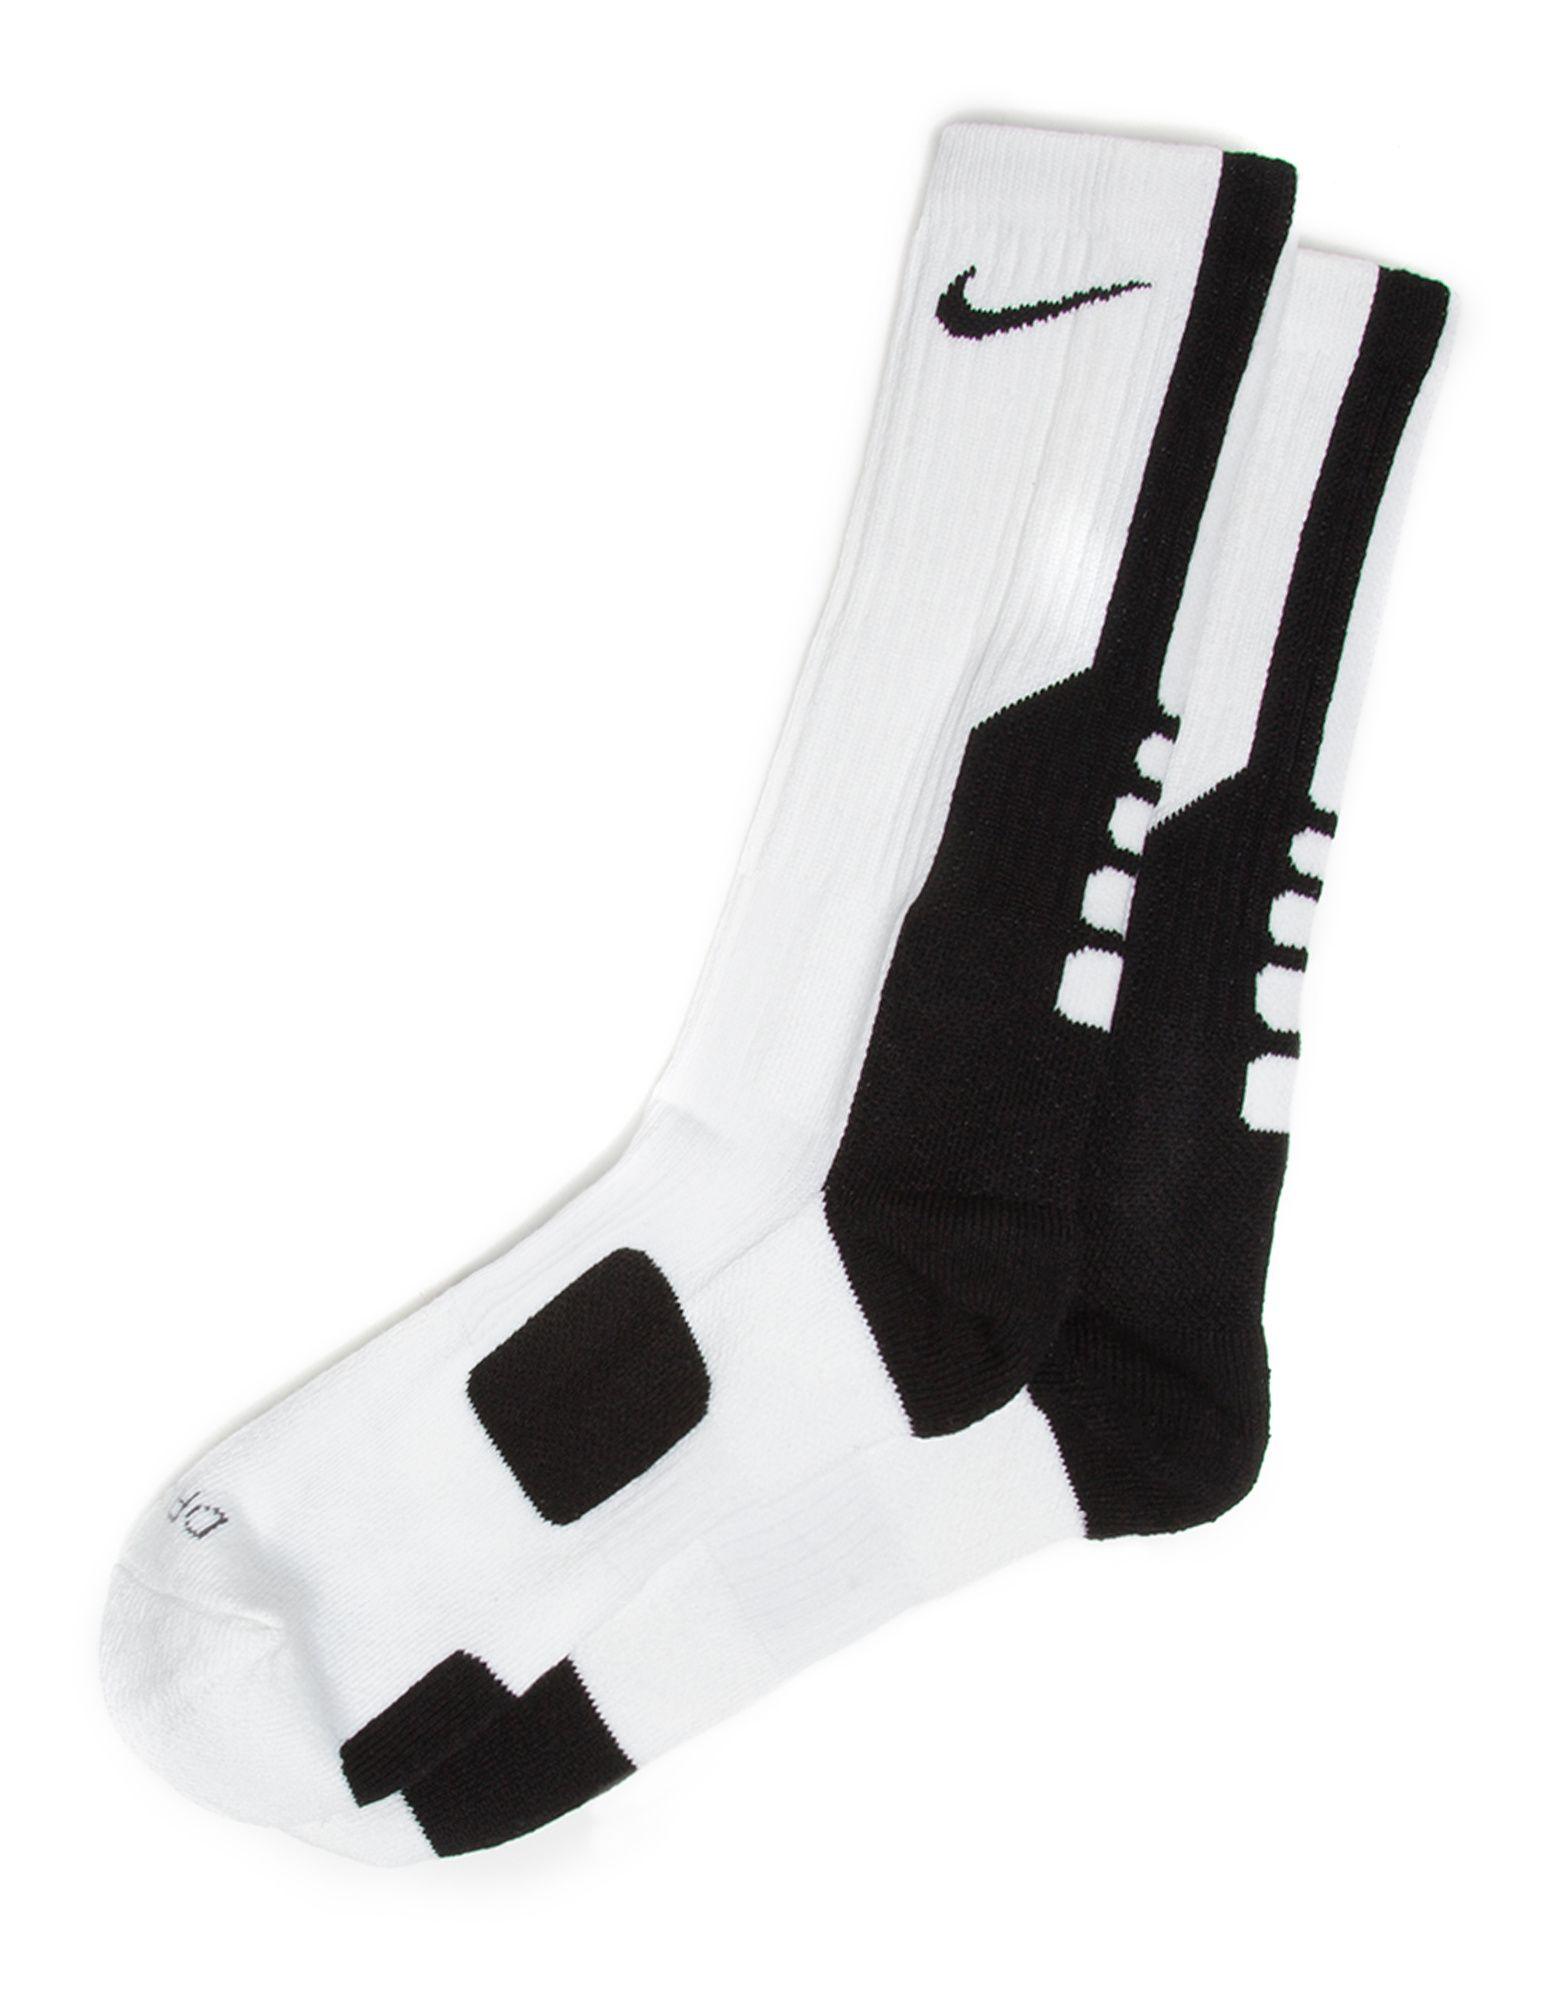 Nike Basketball Crew Socks